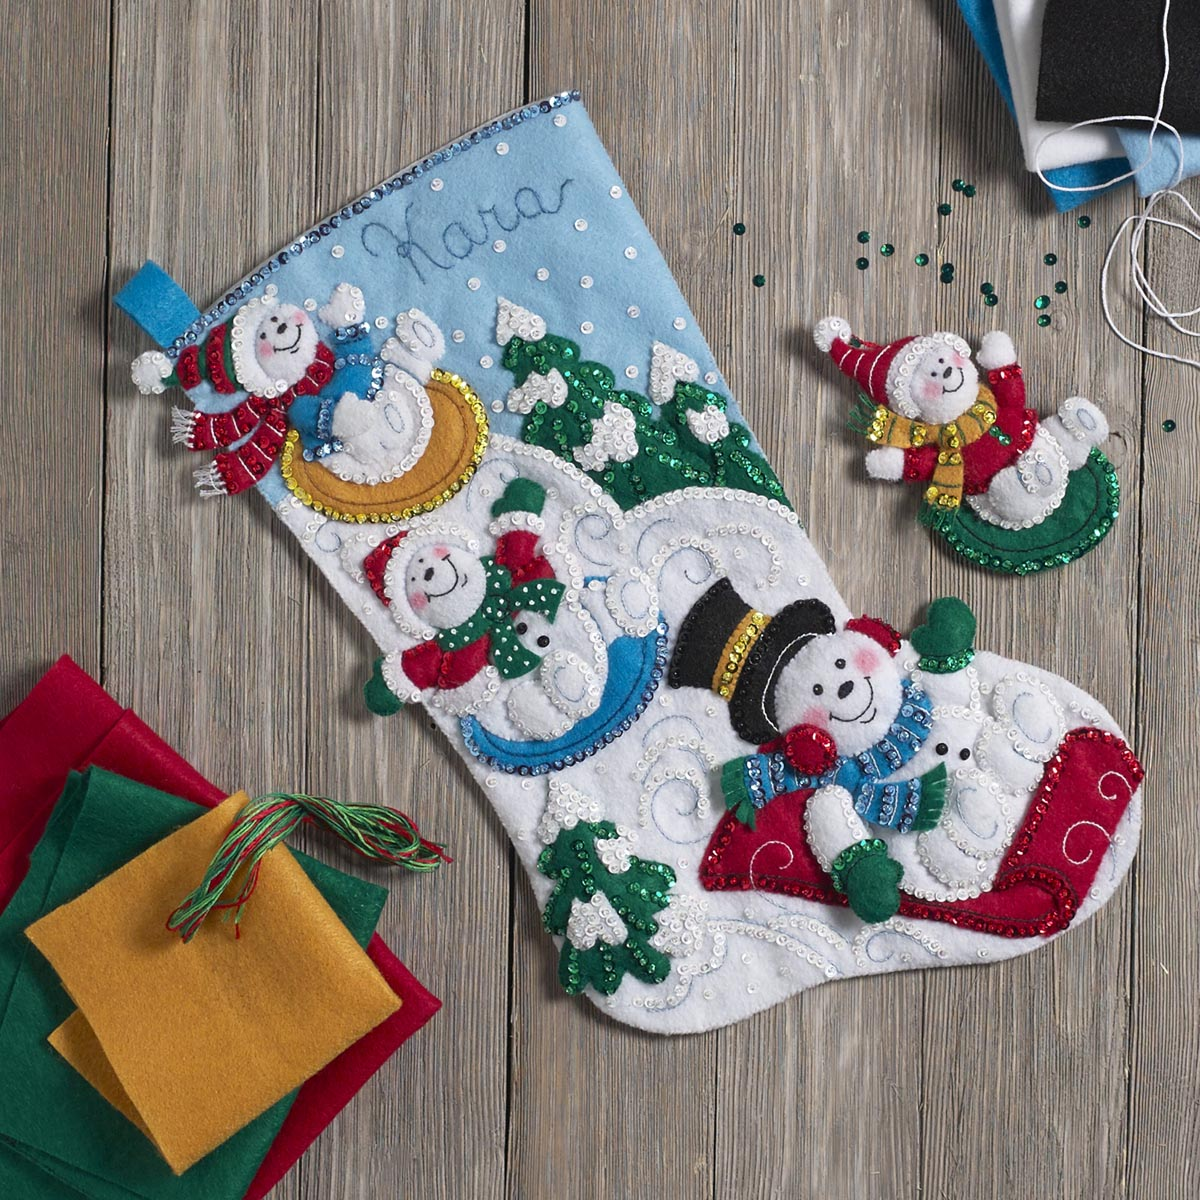 Bucilla ® Seasonal - Felt - Stocking Kits - Snowday Fun Day